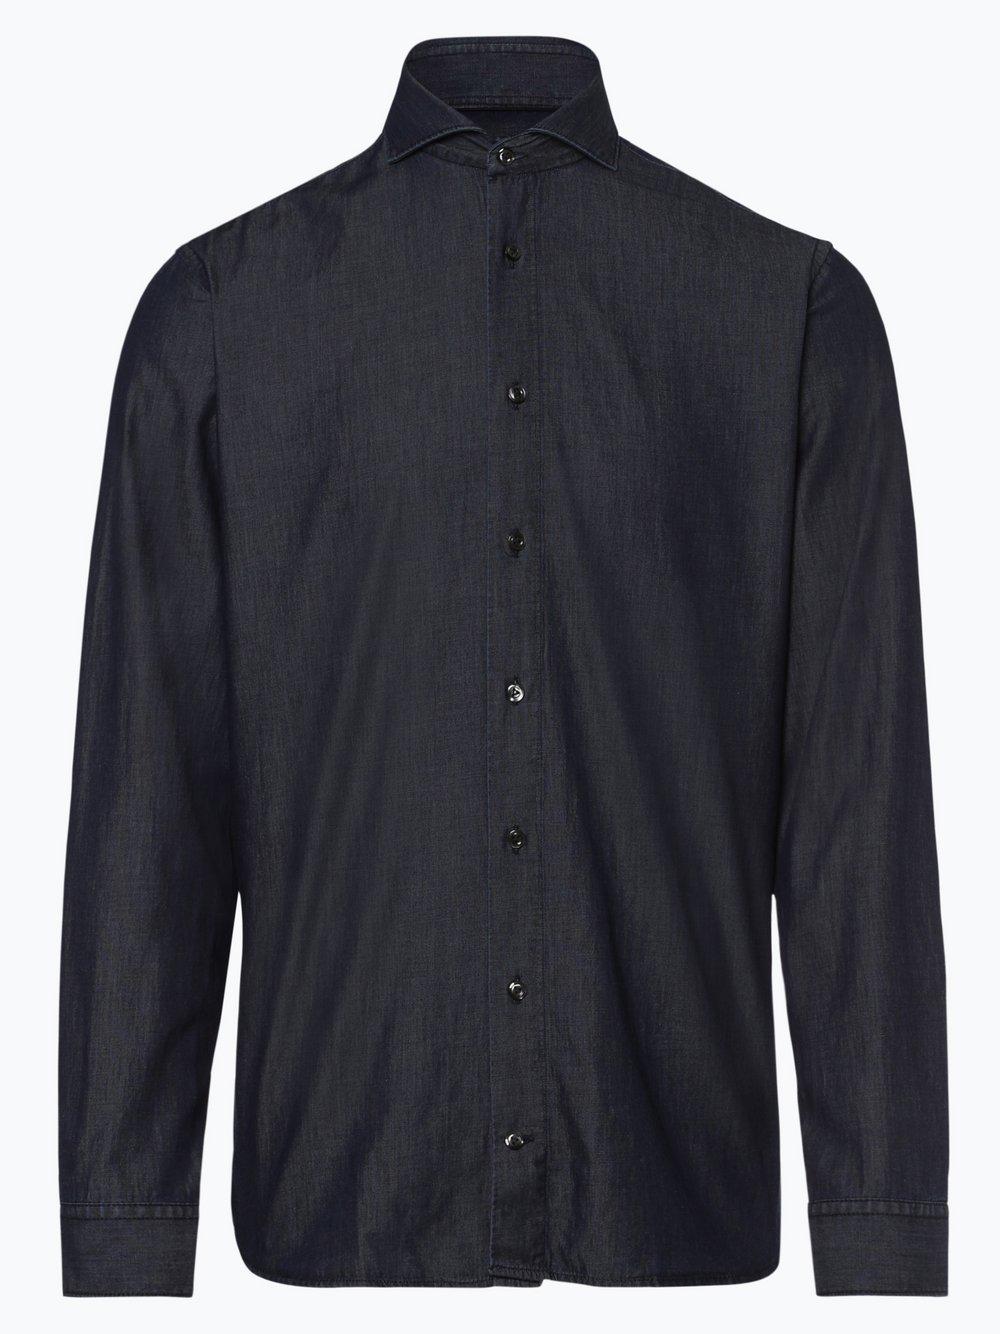 Van Laack – Koszula męska, niebieski Van Graaf 444155-0001-00410